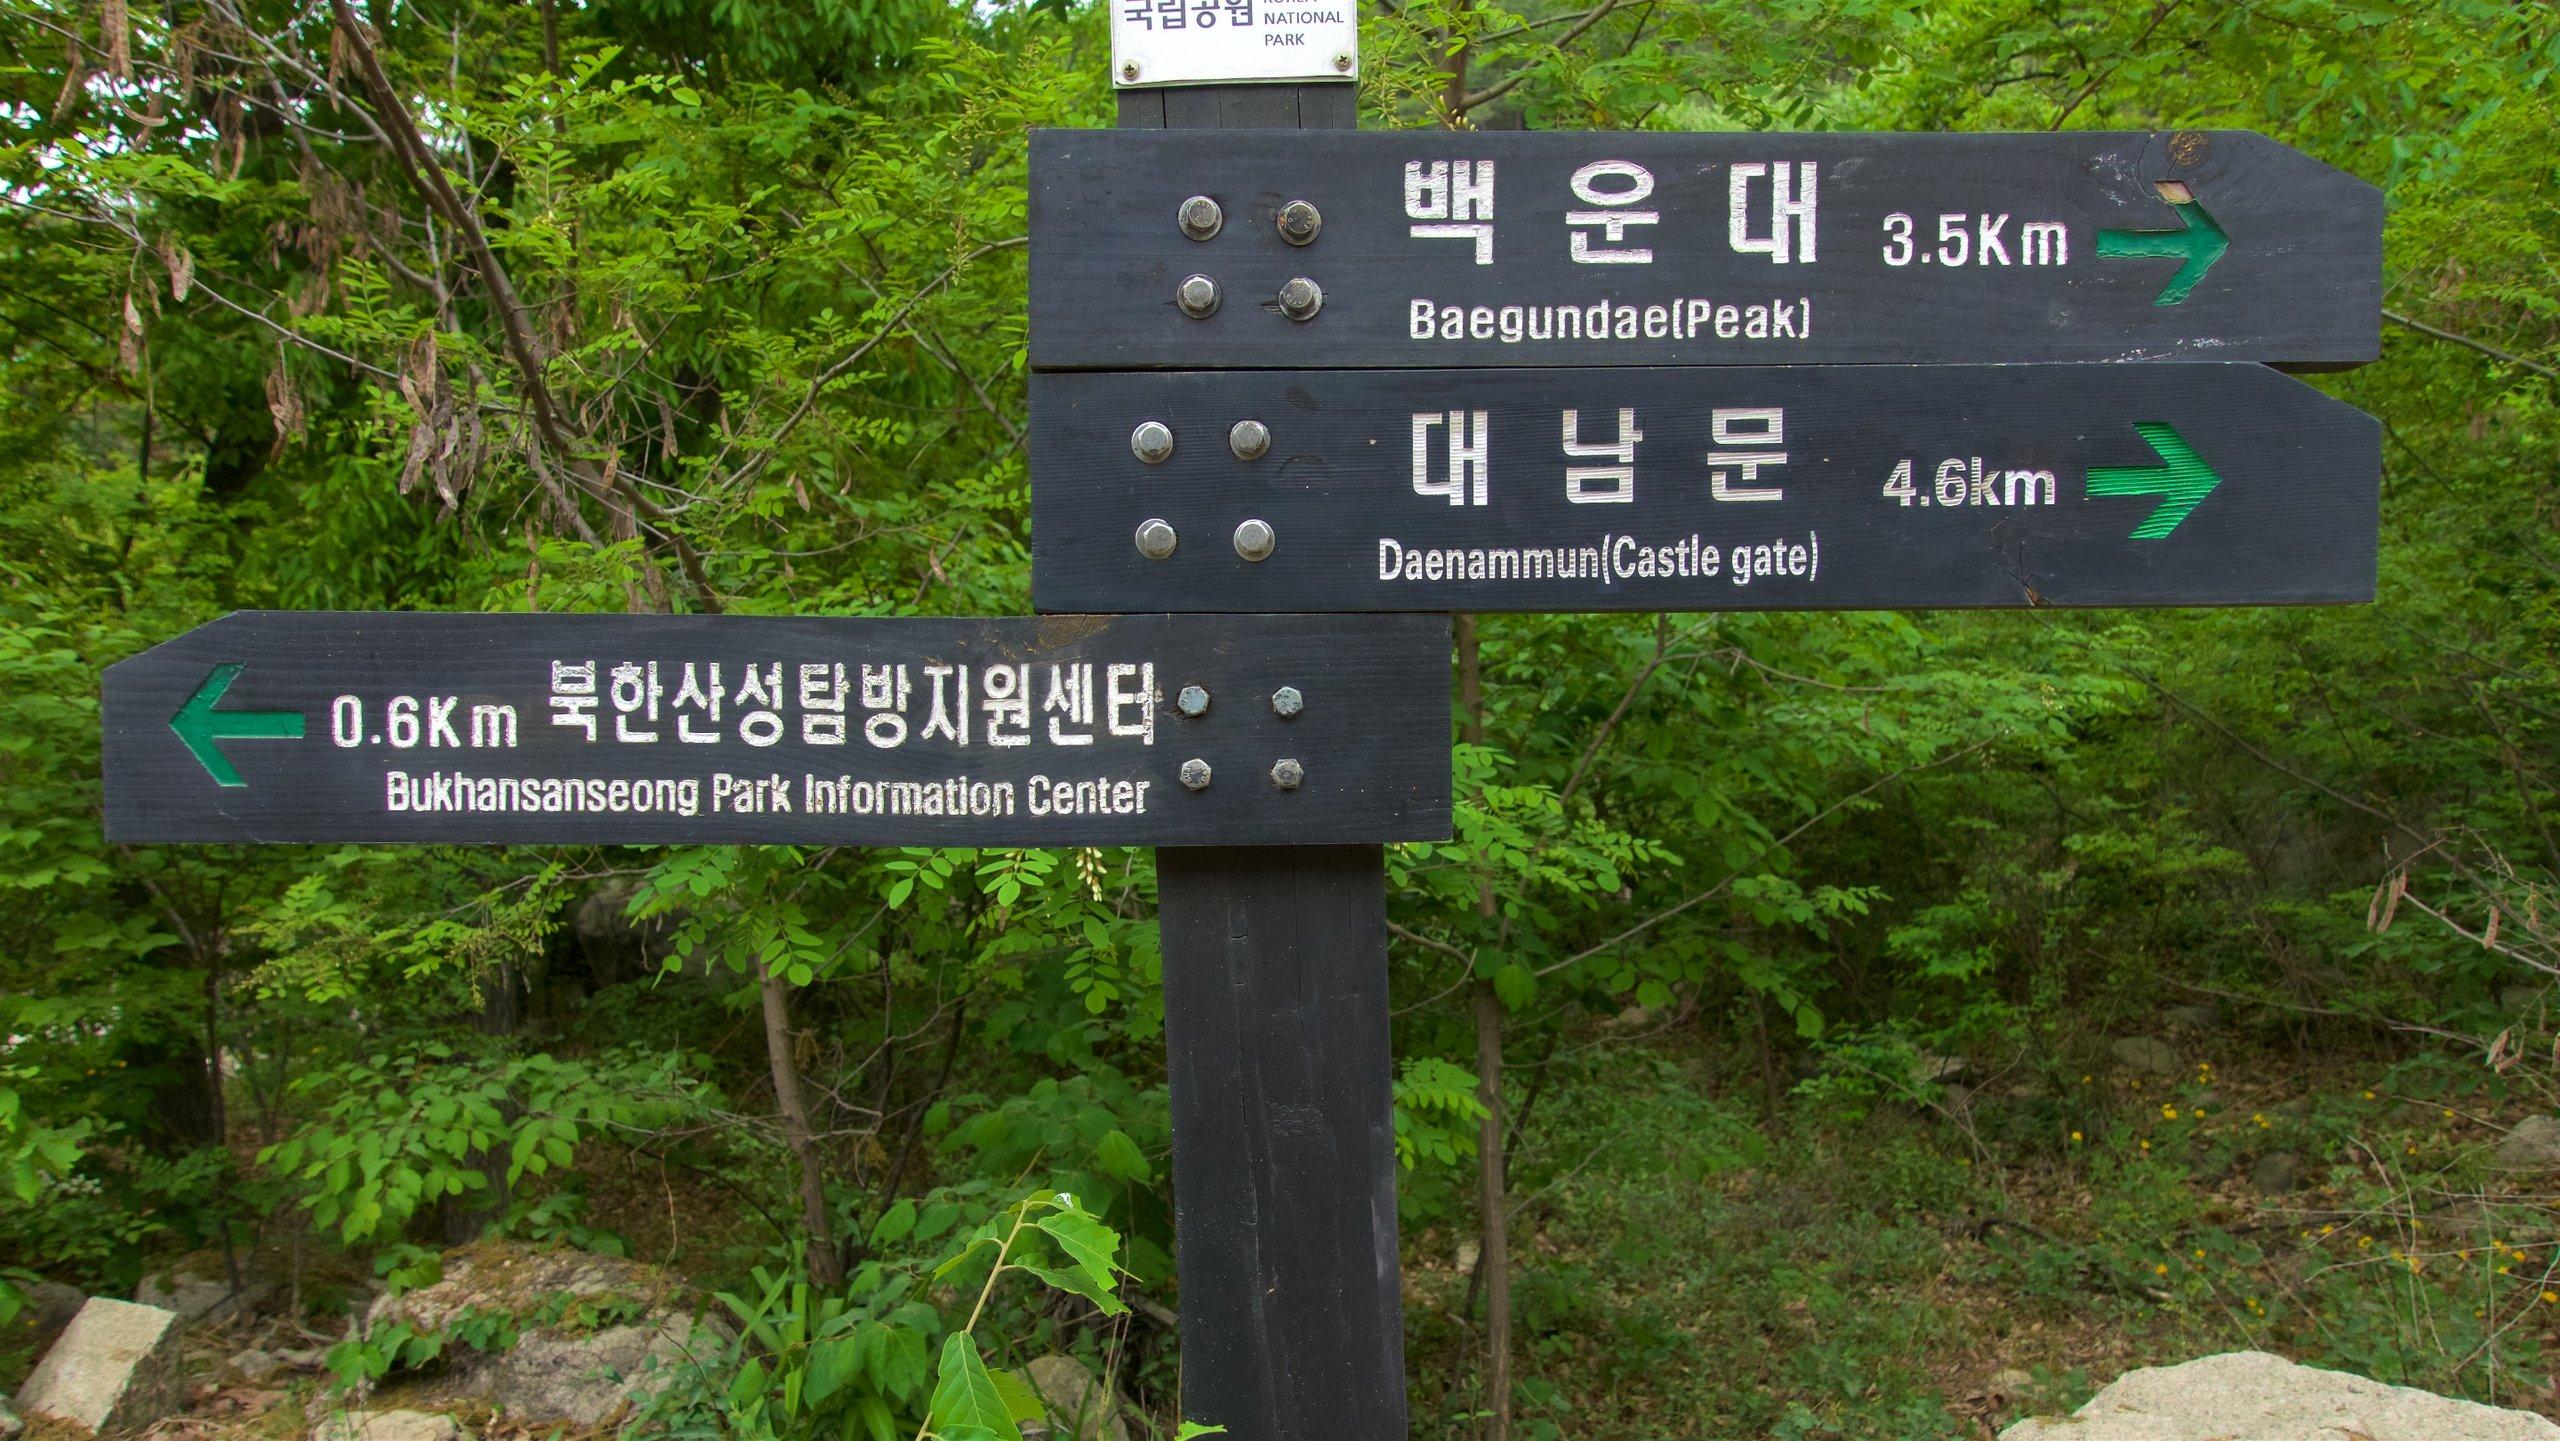 Goyang, Gyeonggi, South Korea